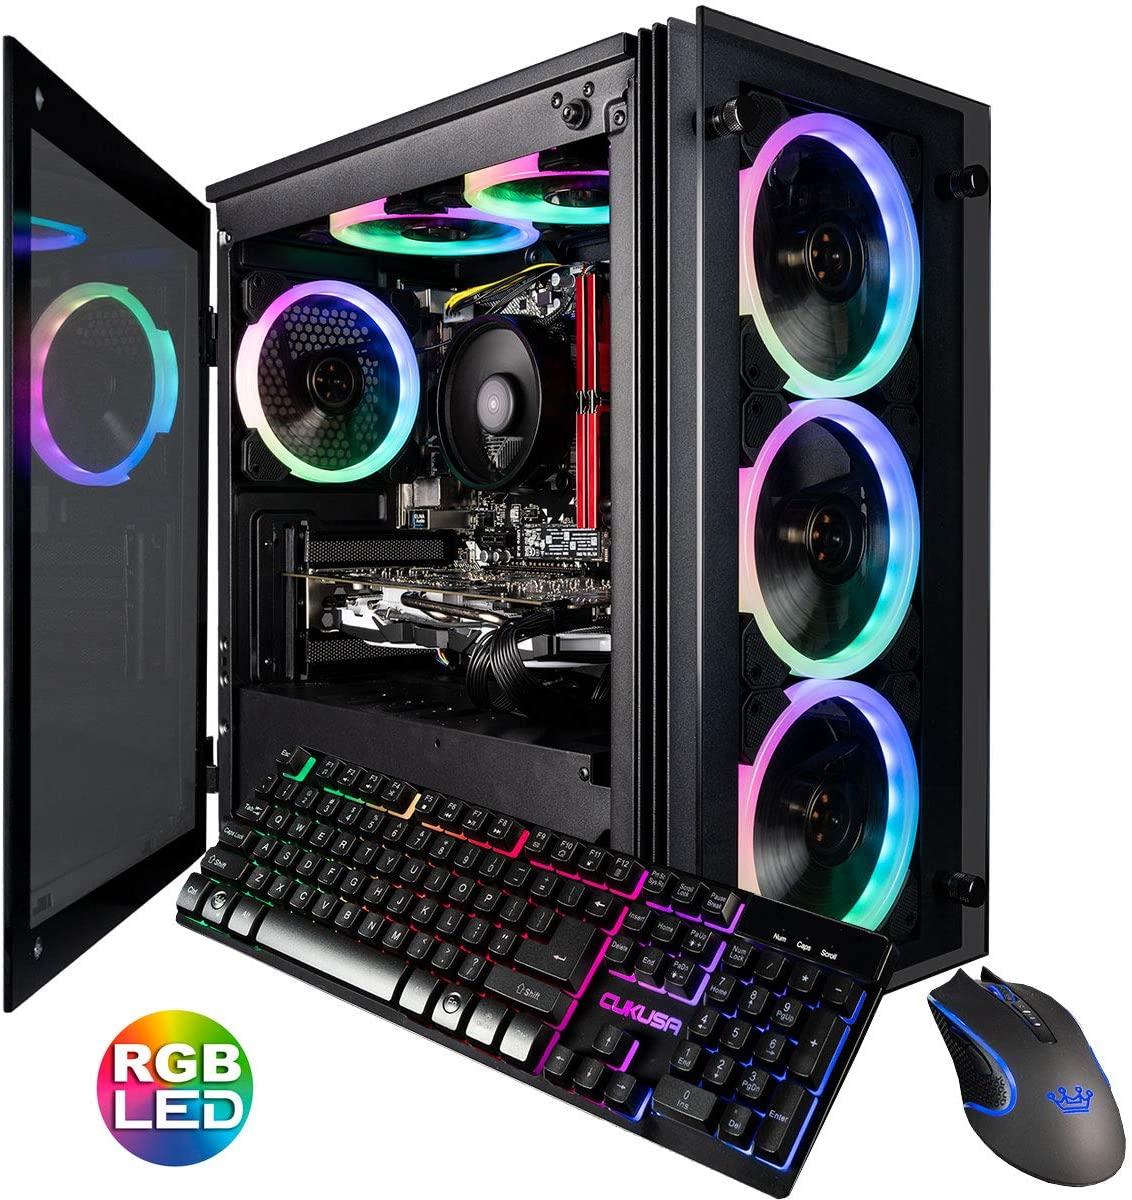 CUK Stratos Micro Gaming Desktop (Intel i7-9700F, 32GB DDR4 RAM, 1TB NVMe SSD + 2TB HDD, NVIDIA GeForce RTX 2070 8GB, 600W Gold PSU, Windows 10 Home) Gamer PC Computer